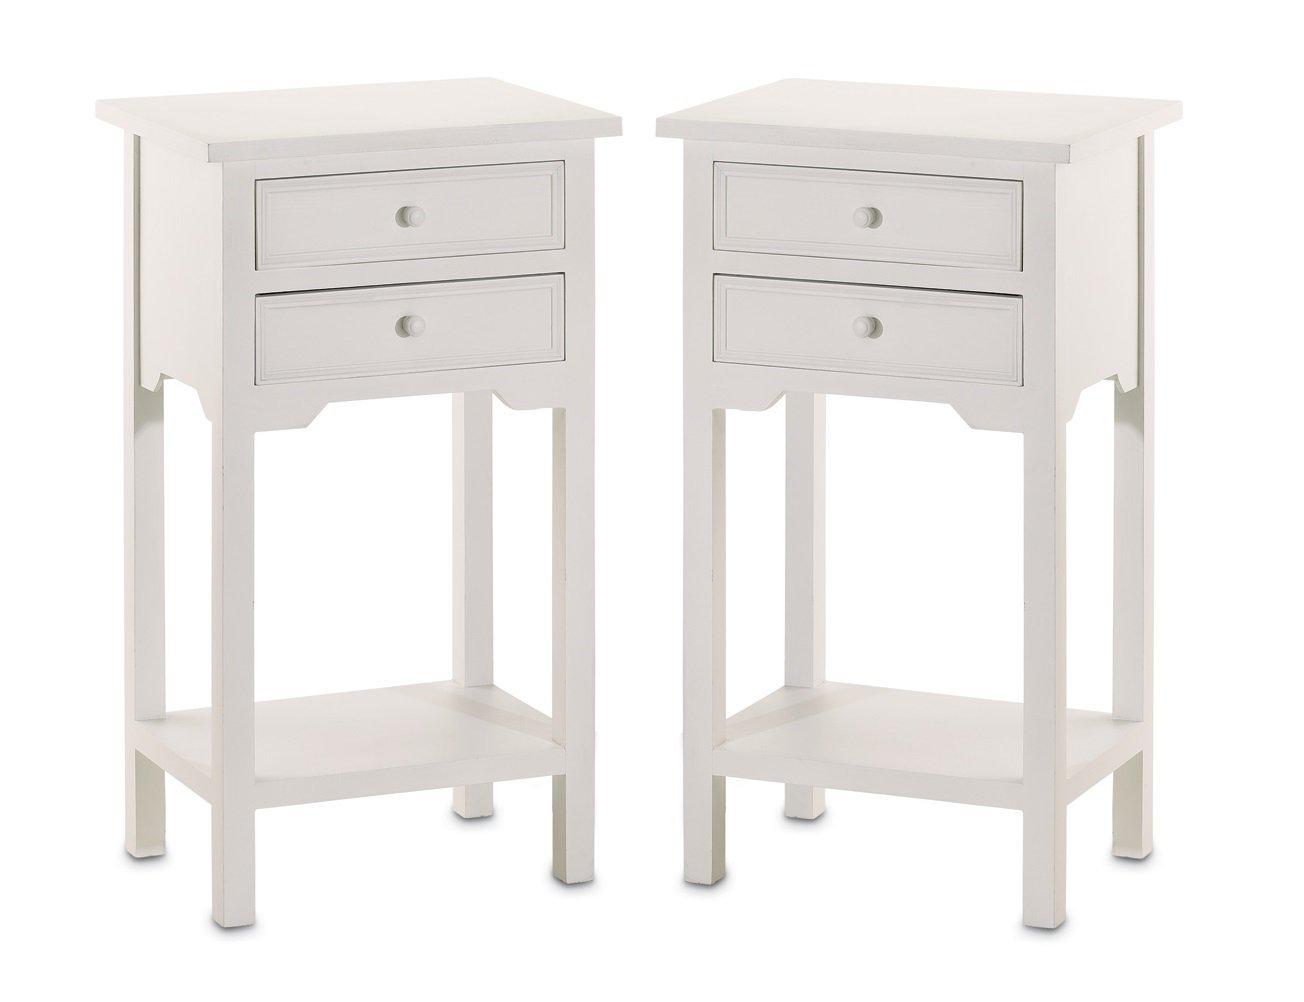 beautiful black sonoma tall drawer nightstand lorraine espresso wood stand wooden soft monterey finish ellsworth plans white yaleto furniture charlesto calla sauder two edenvale